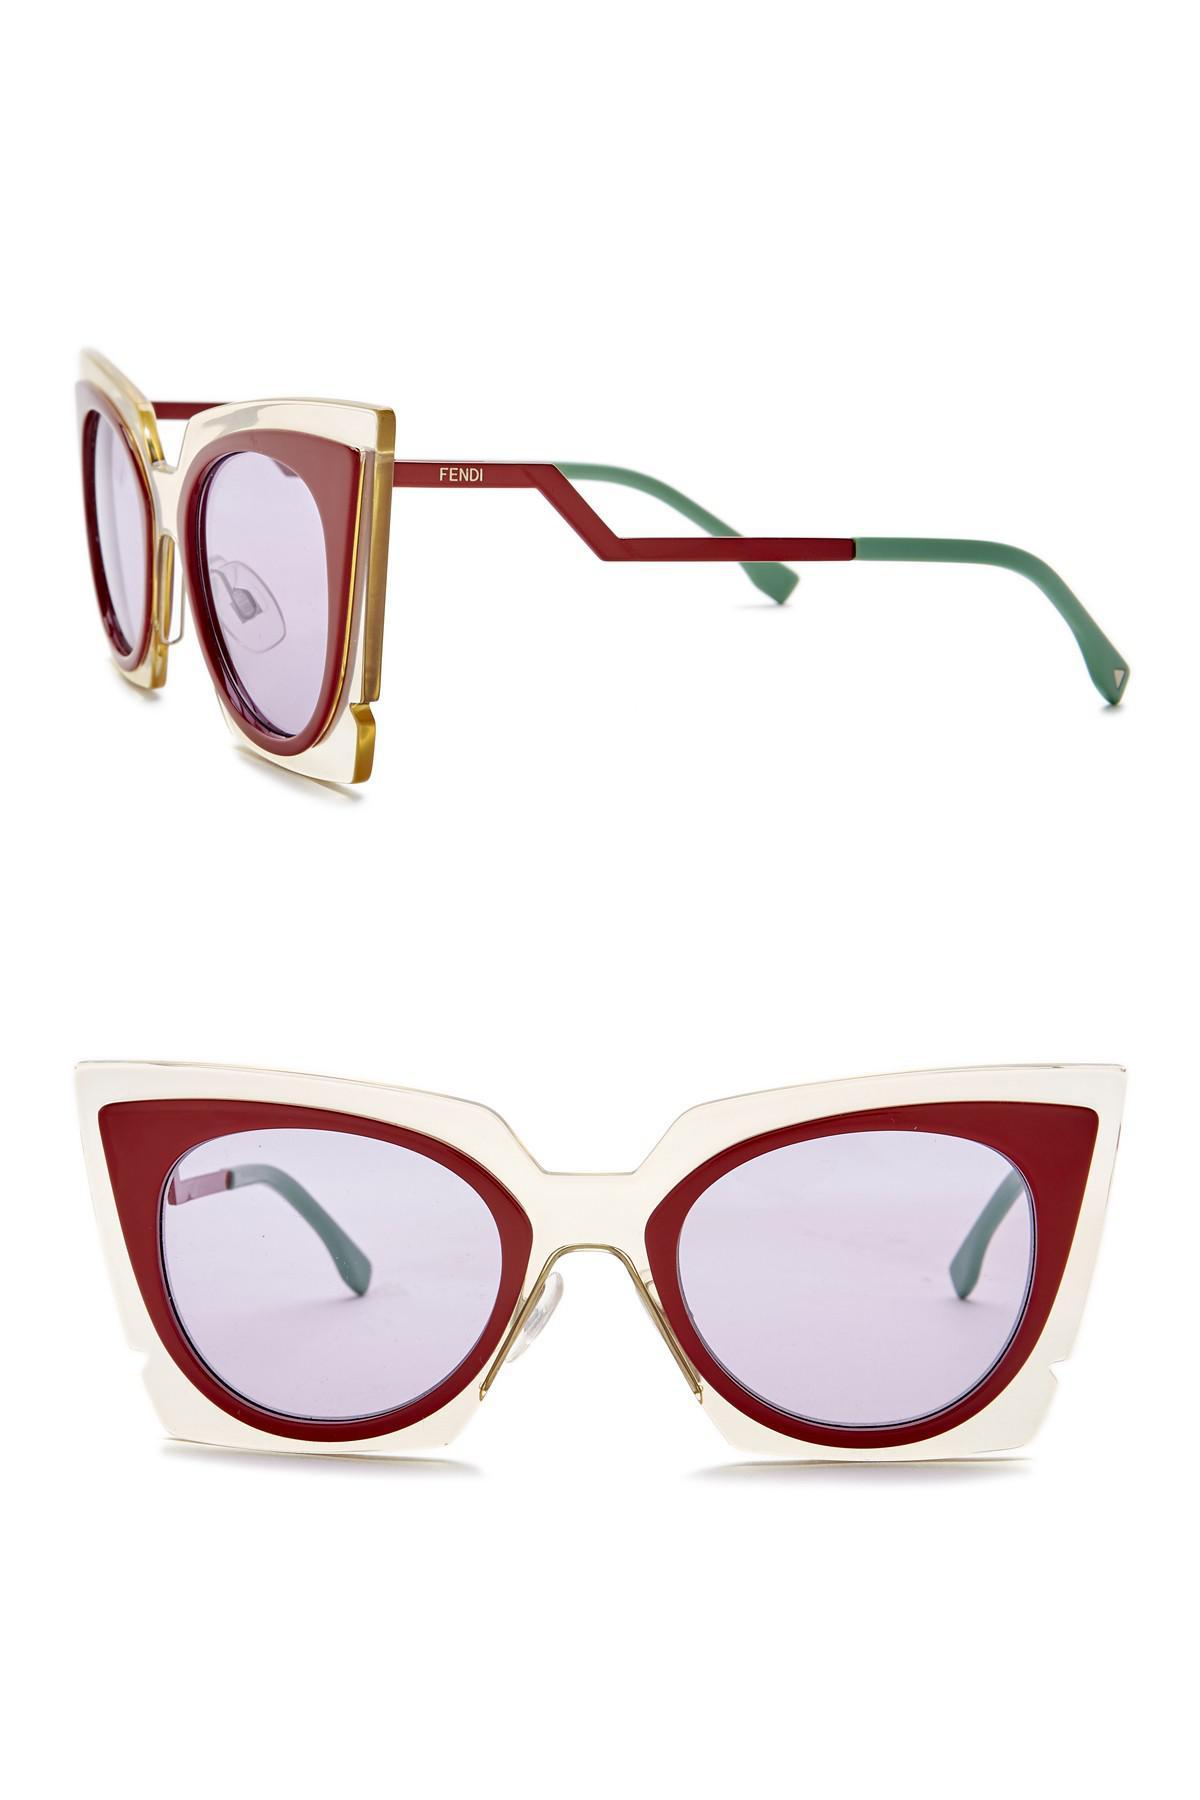 0c72c83202bb3 Fendi 49mm Modified Butterfly Sunglasses - Lyst